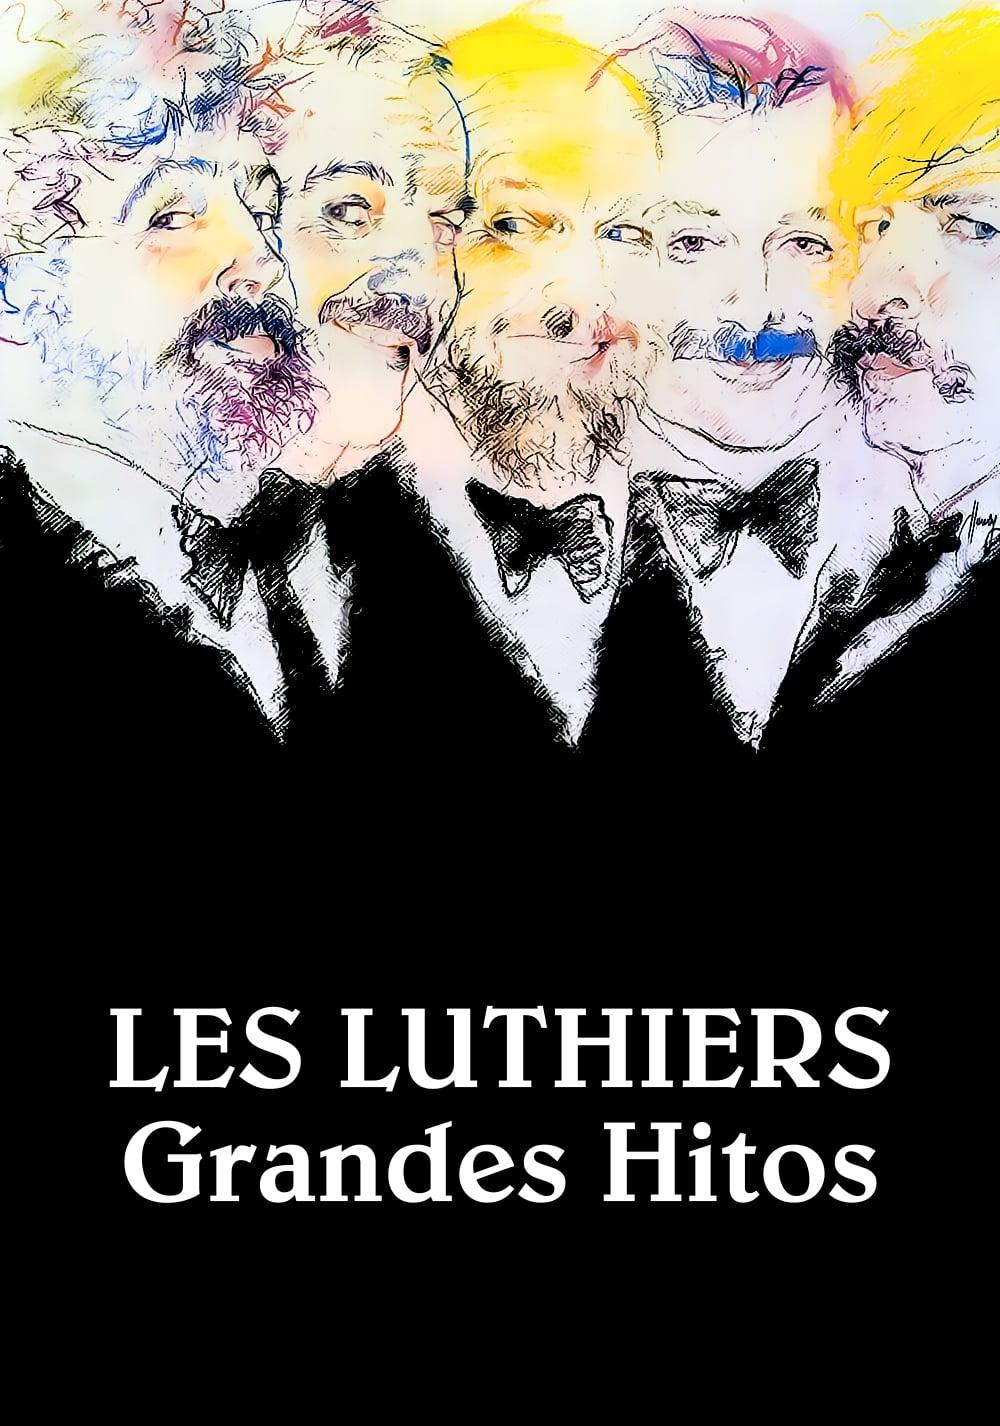 Les Luthiers: Grandes hitos